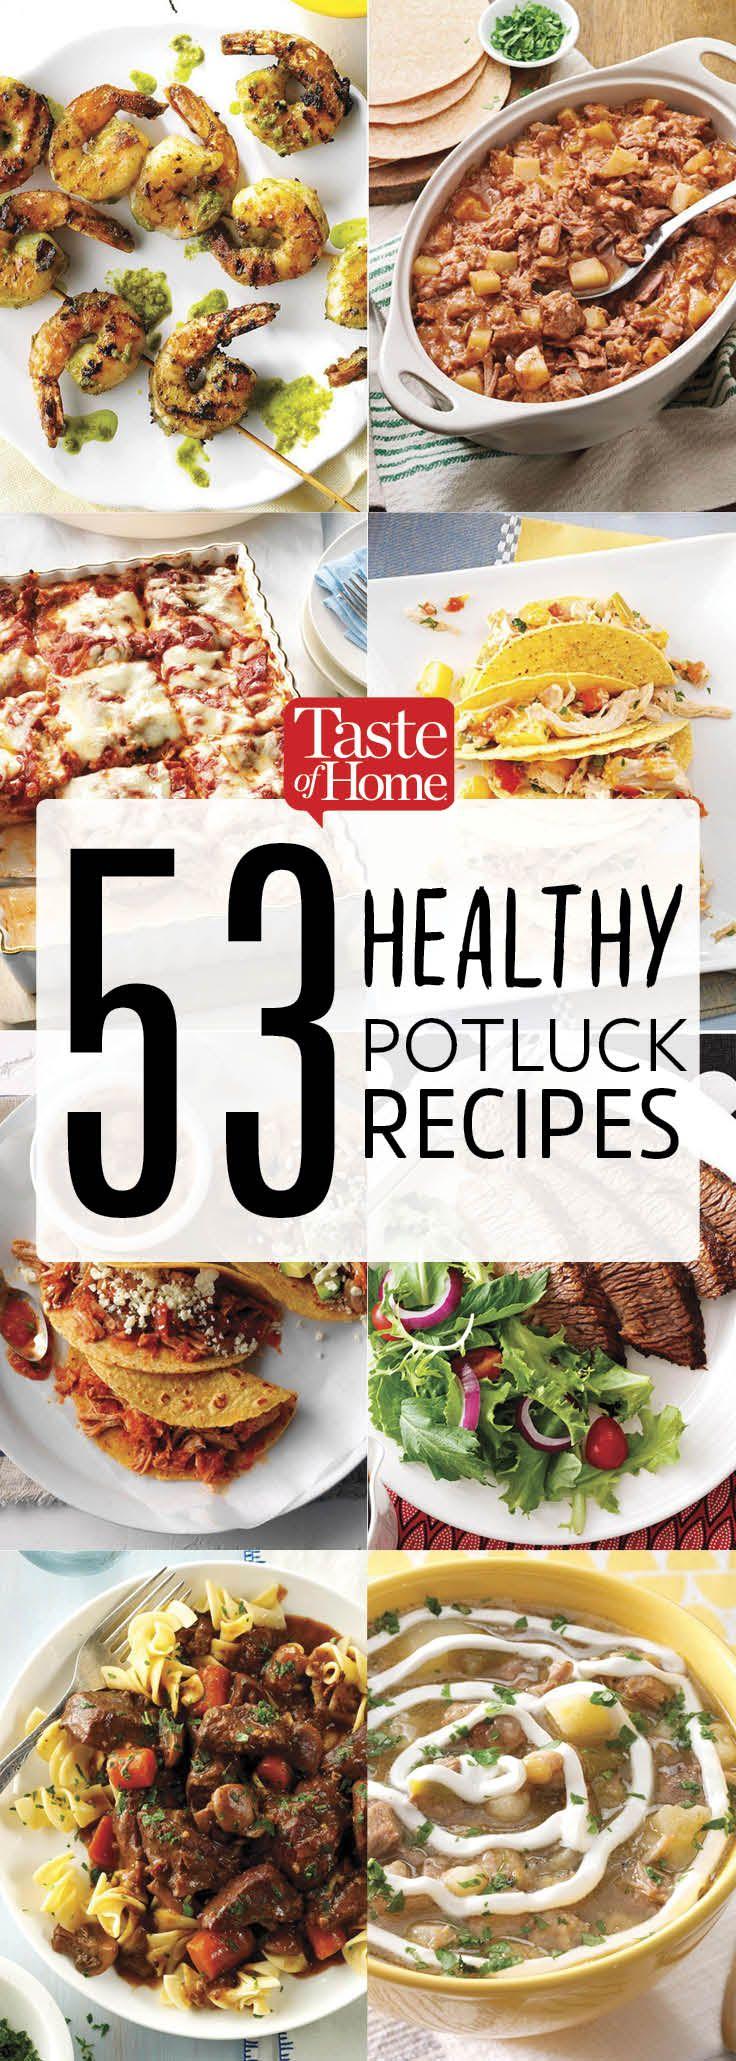 53 Healthy Potluck Recipes #potluckrecipes